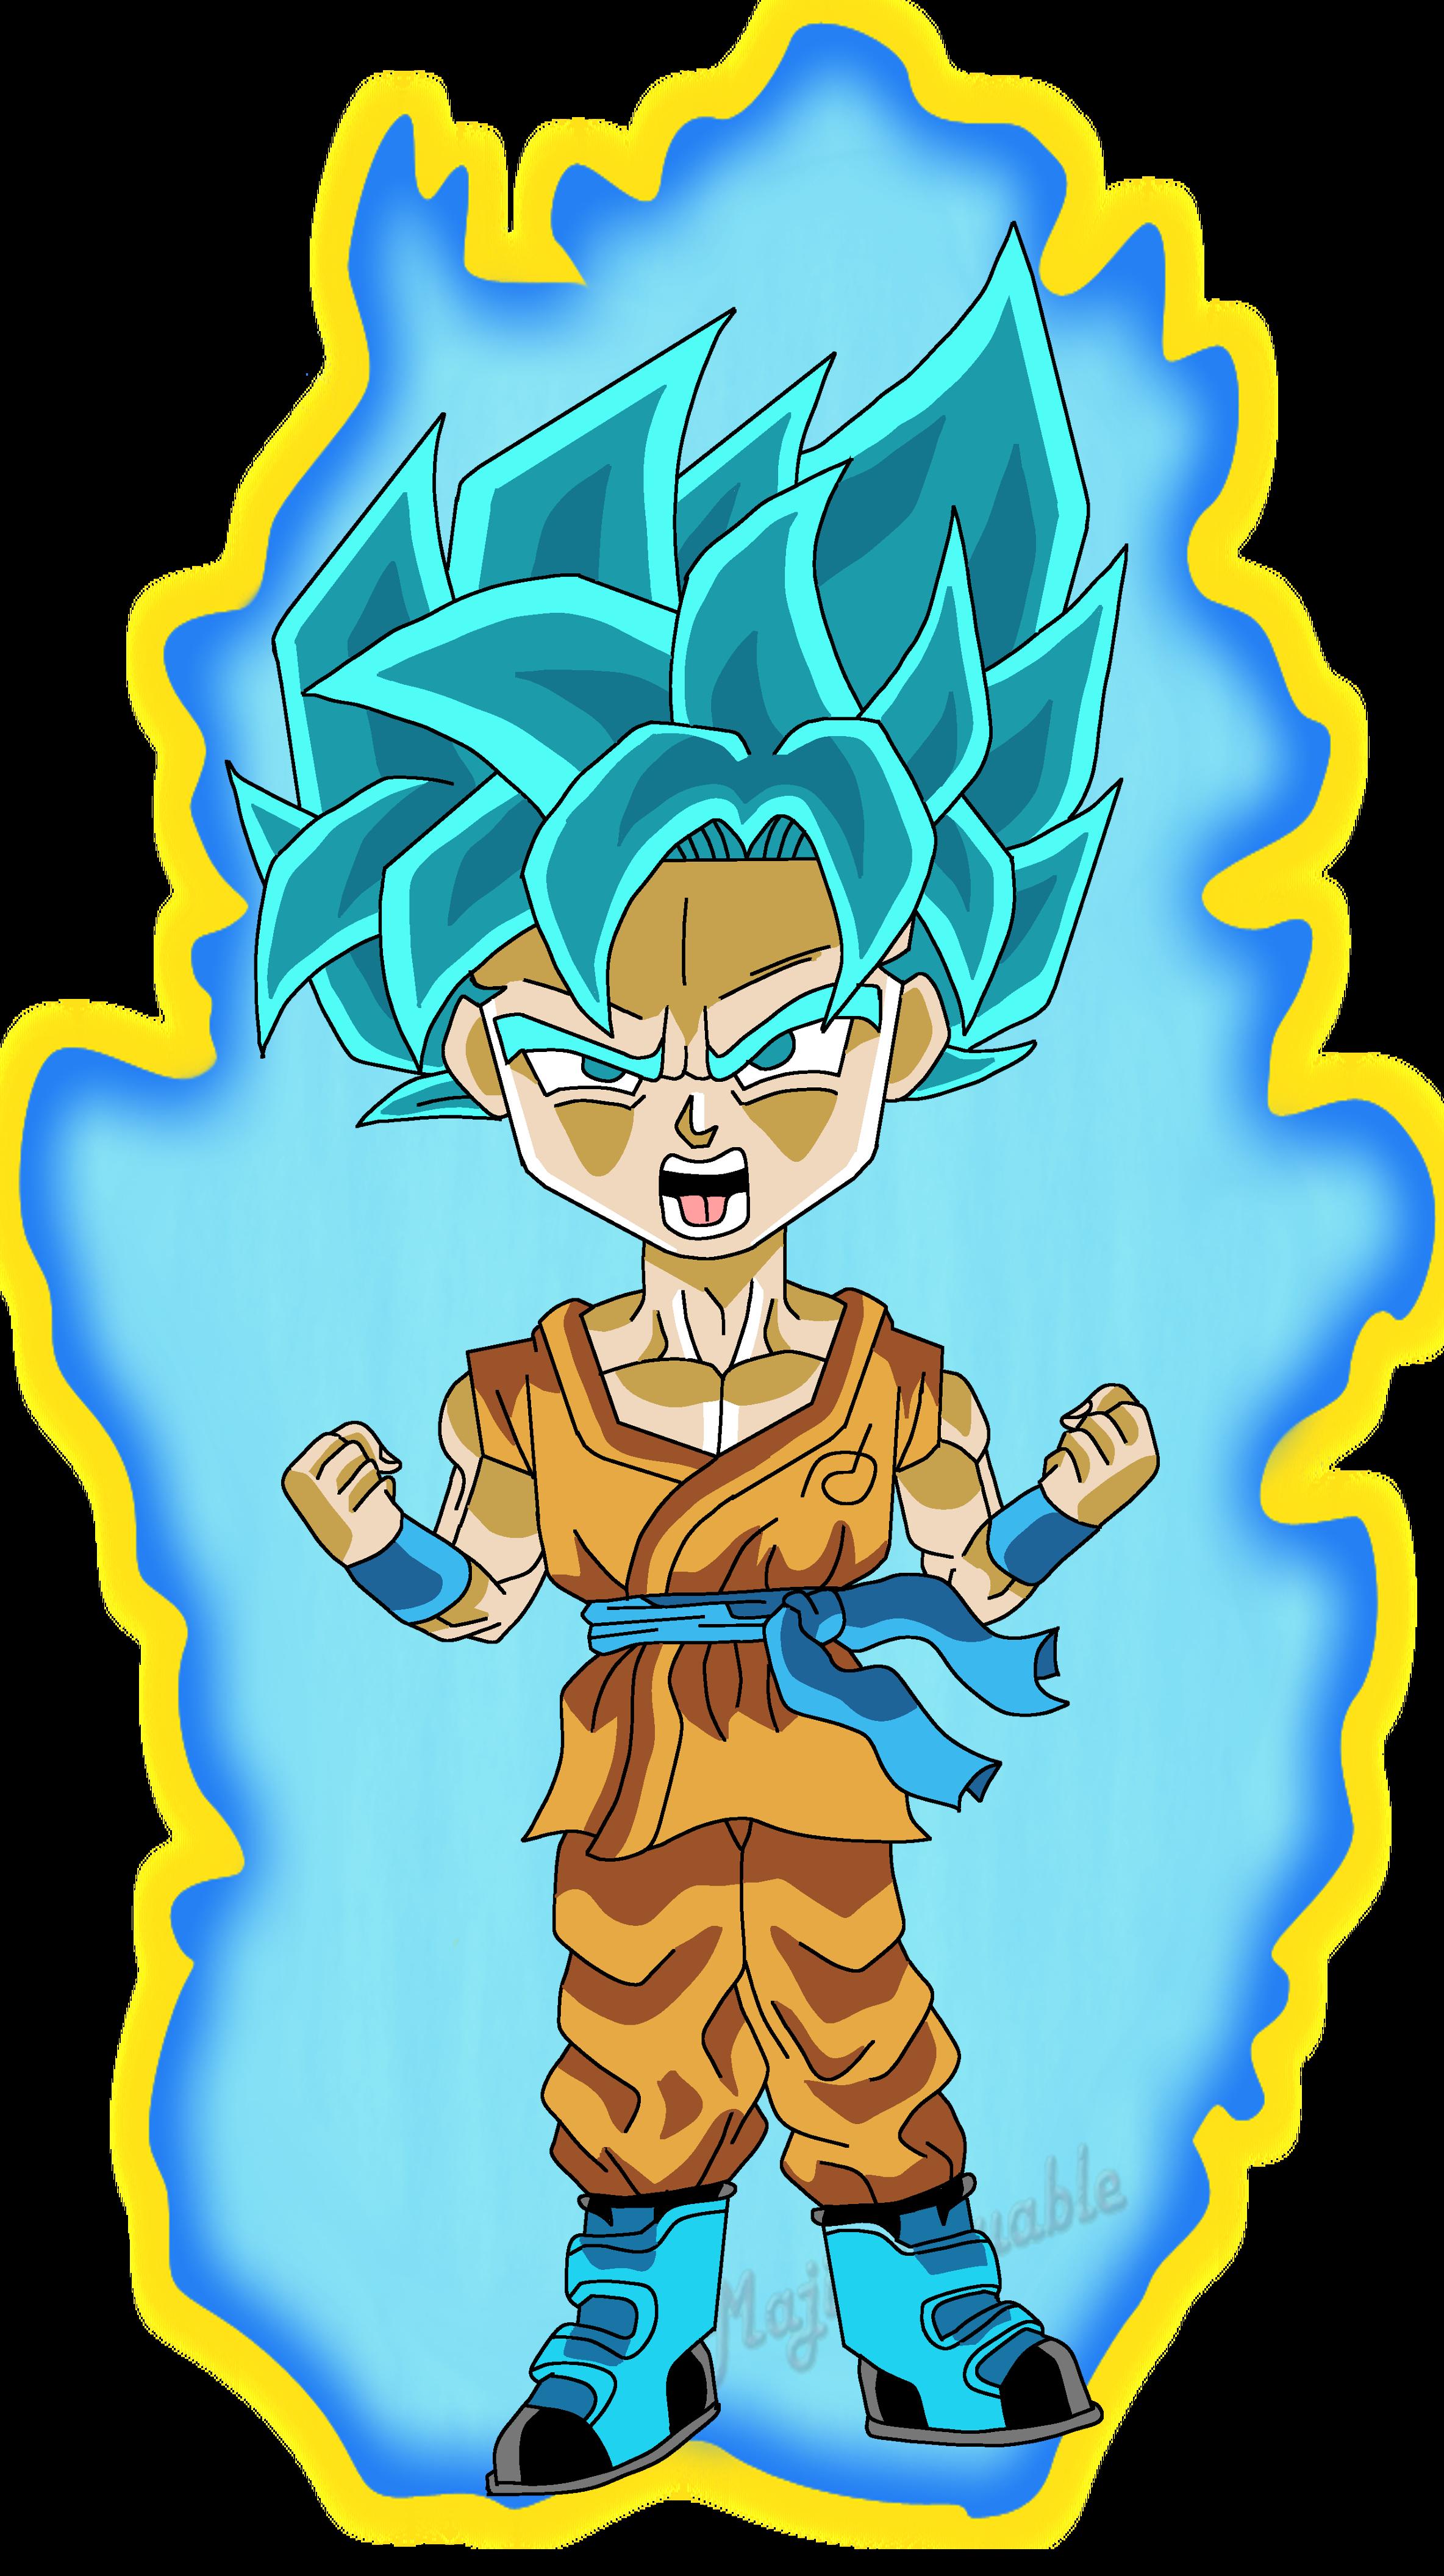 Chibi Super Saiyan Blue Goku By Mrjamierox On Deviantart